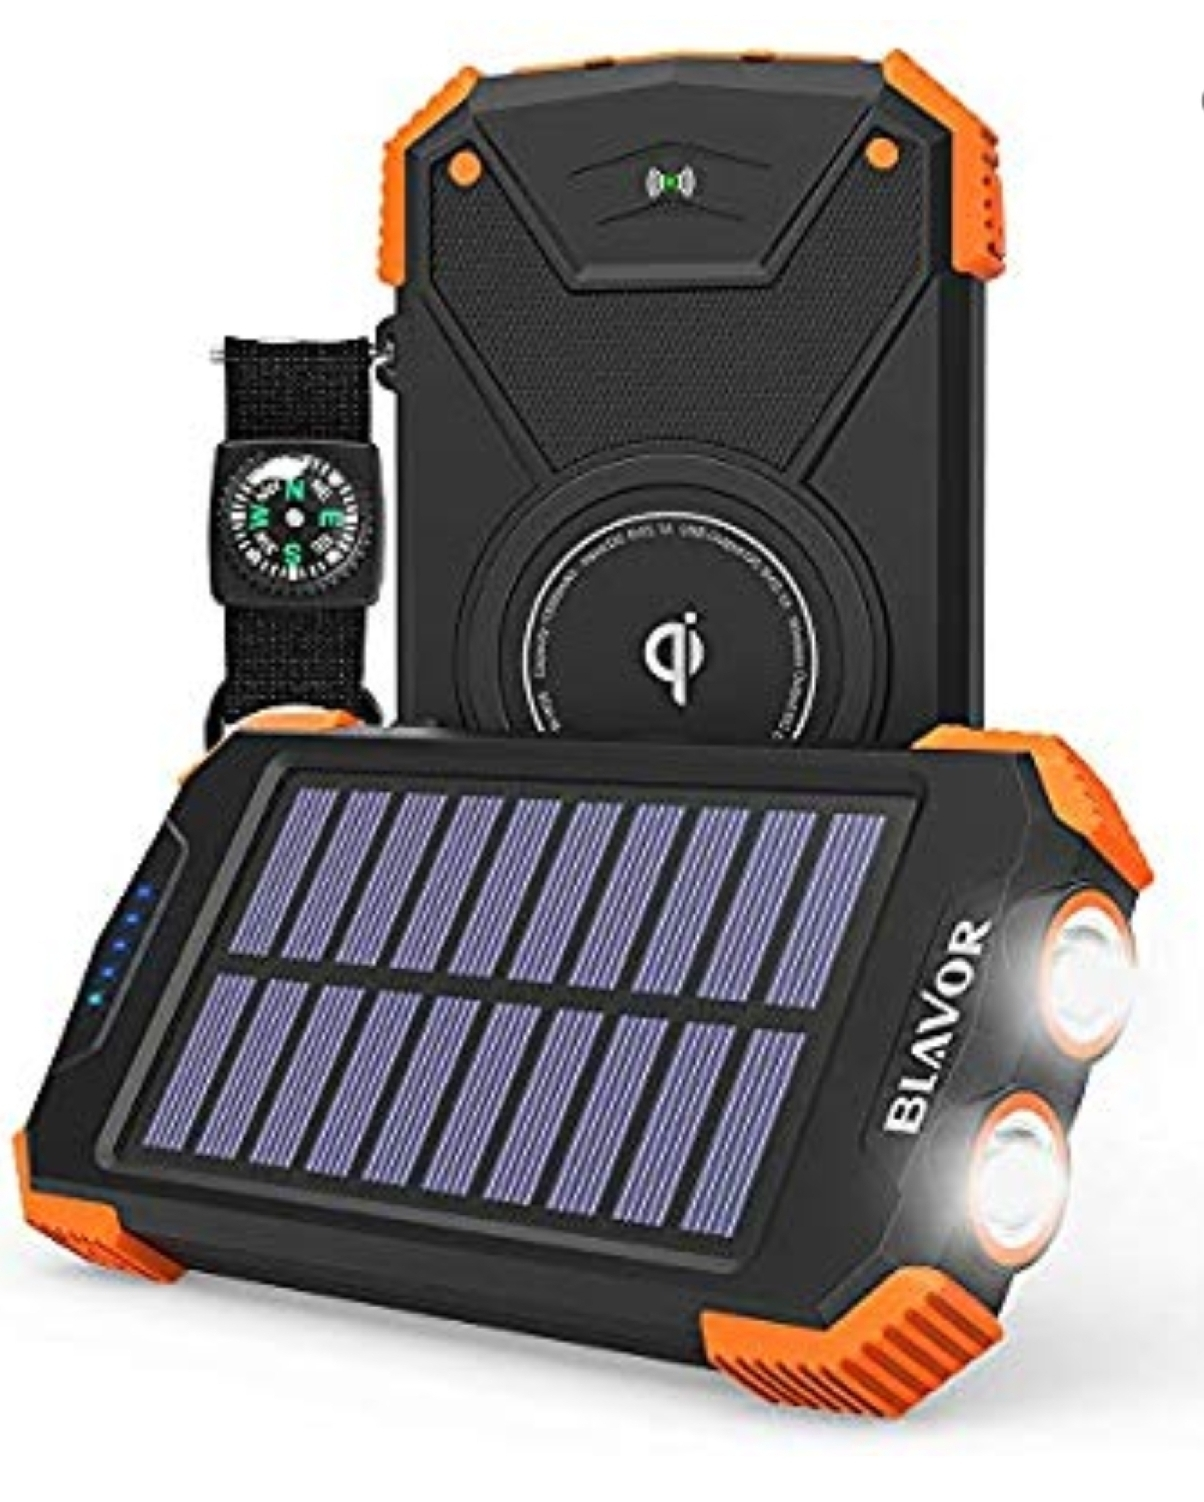 Solar Portable Cellphone Charger